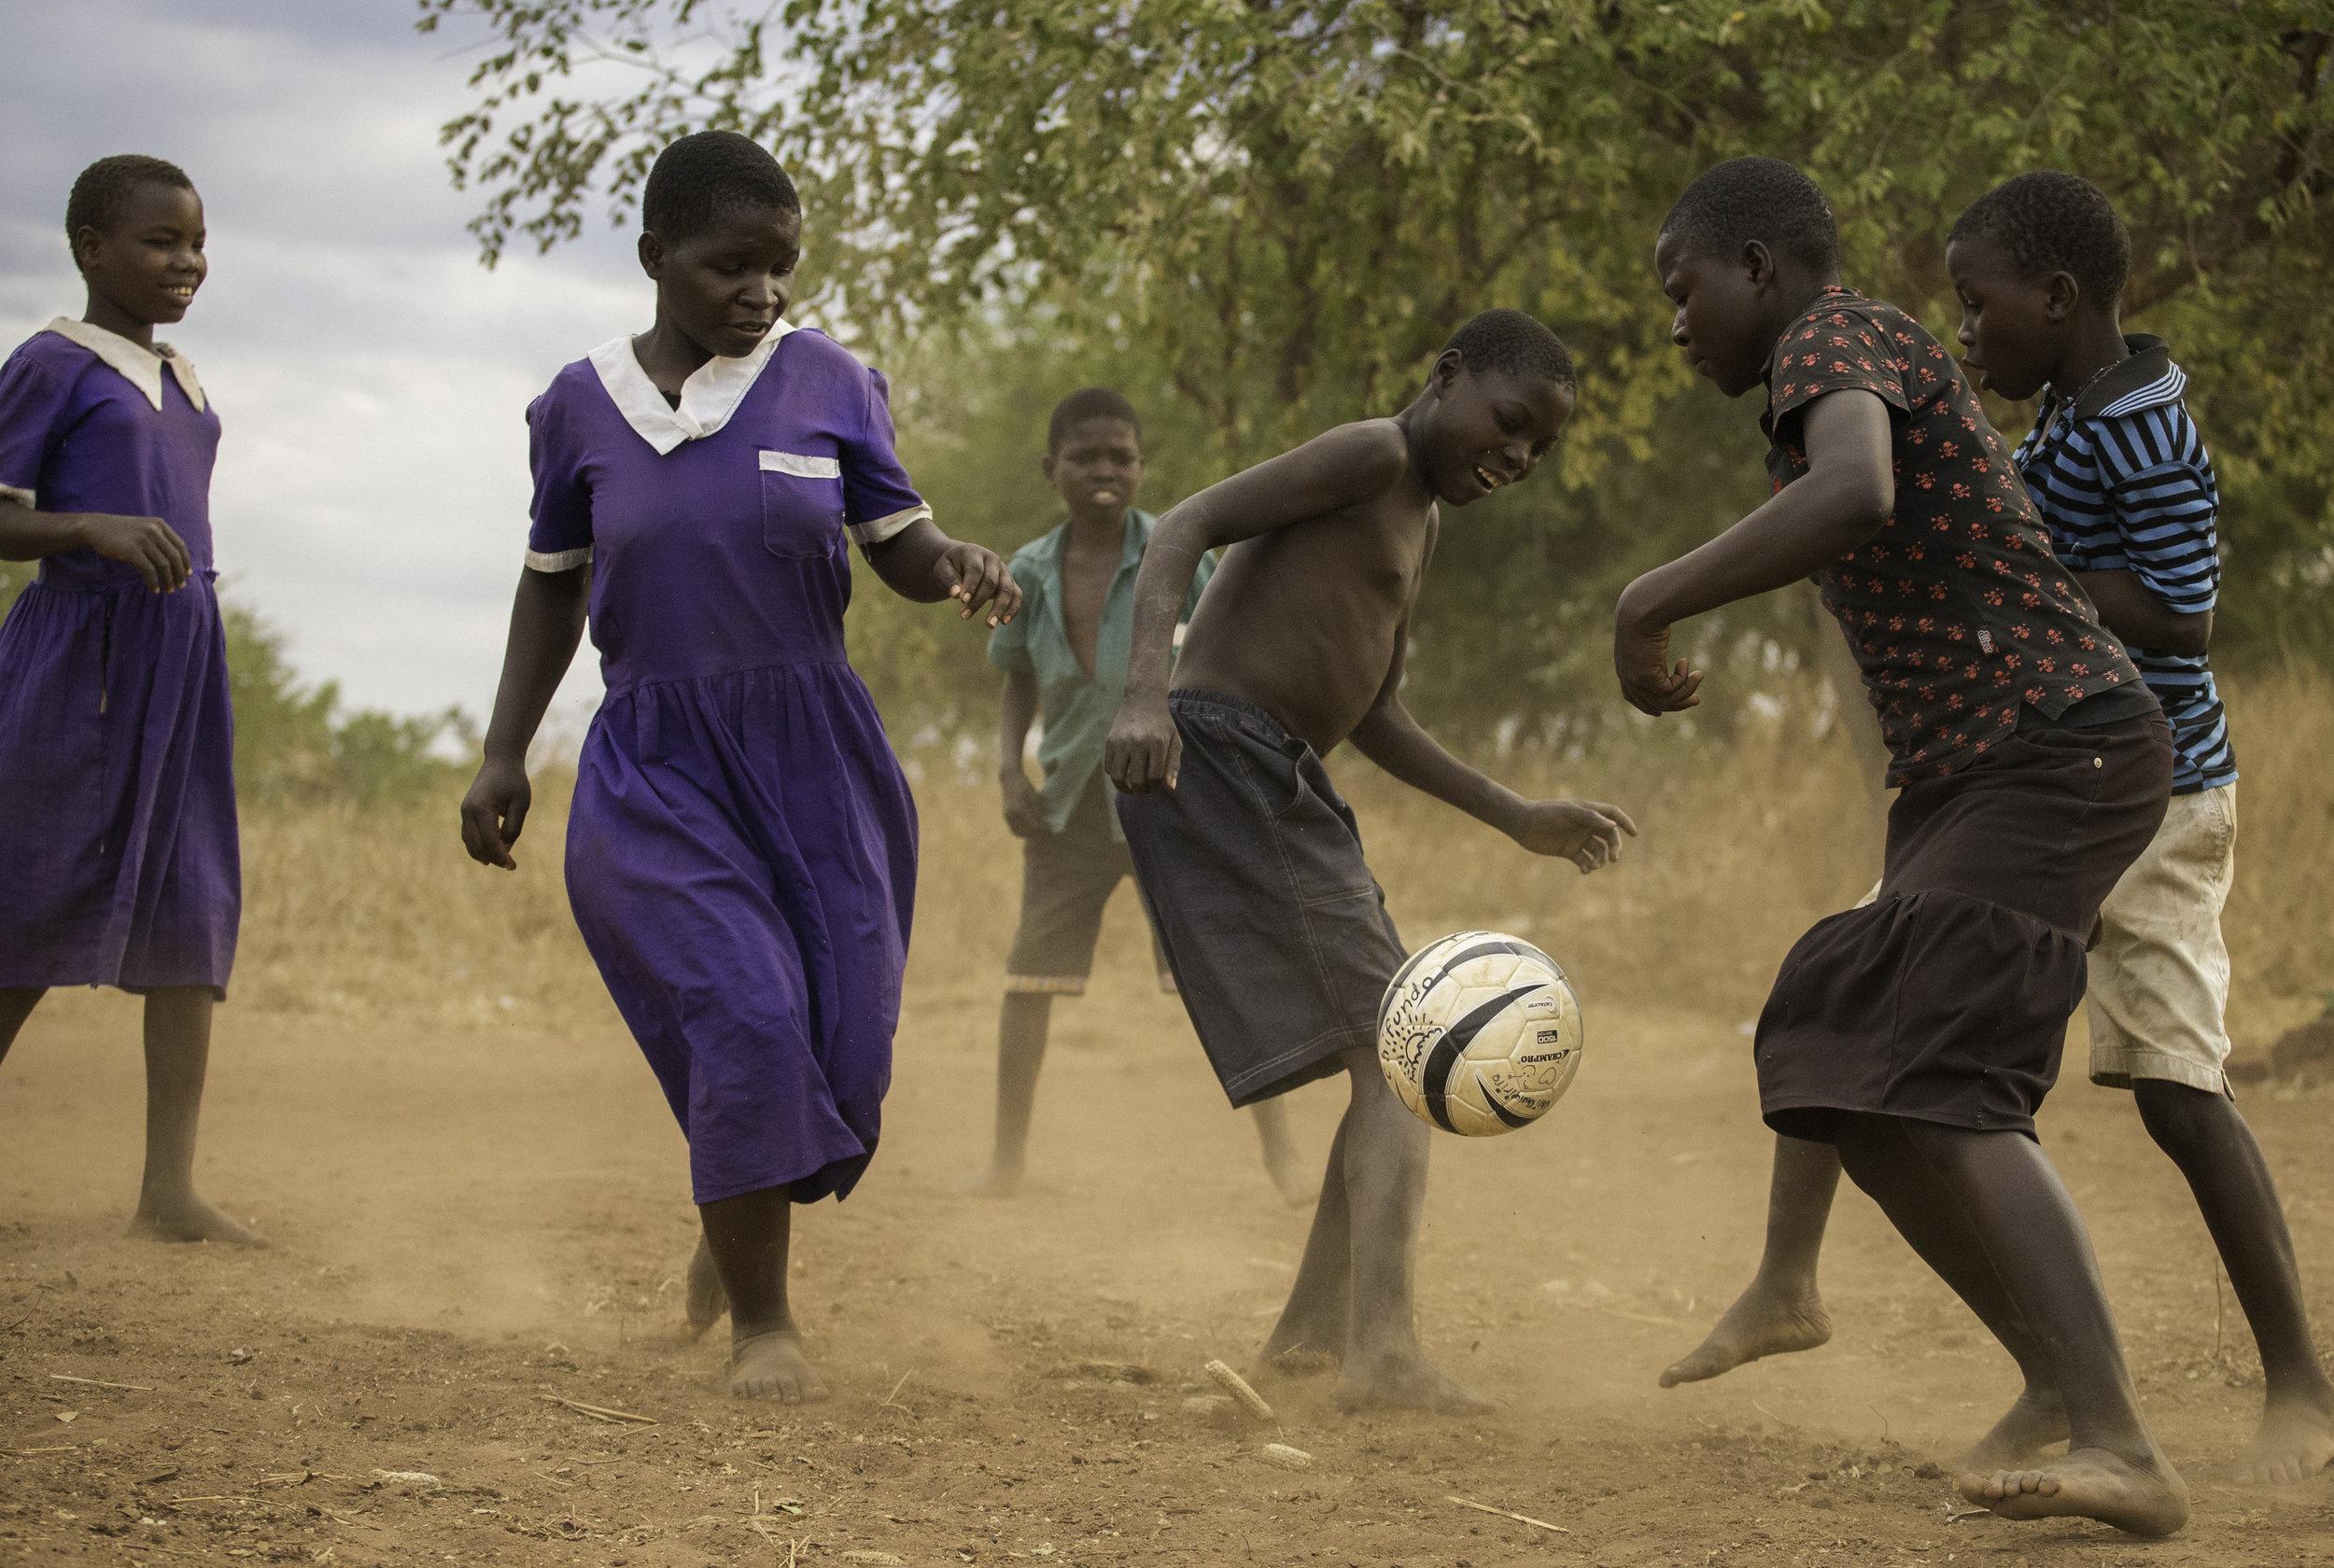 Malawi_soccer 1 (1 of 1).jpg